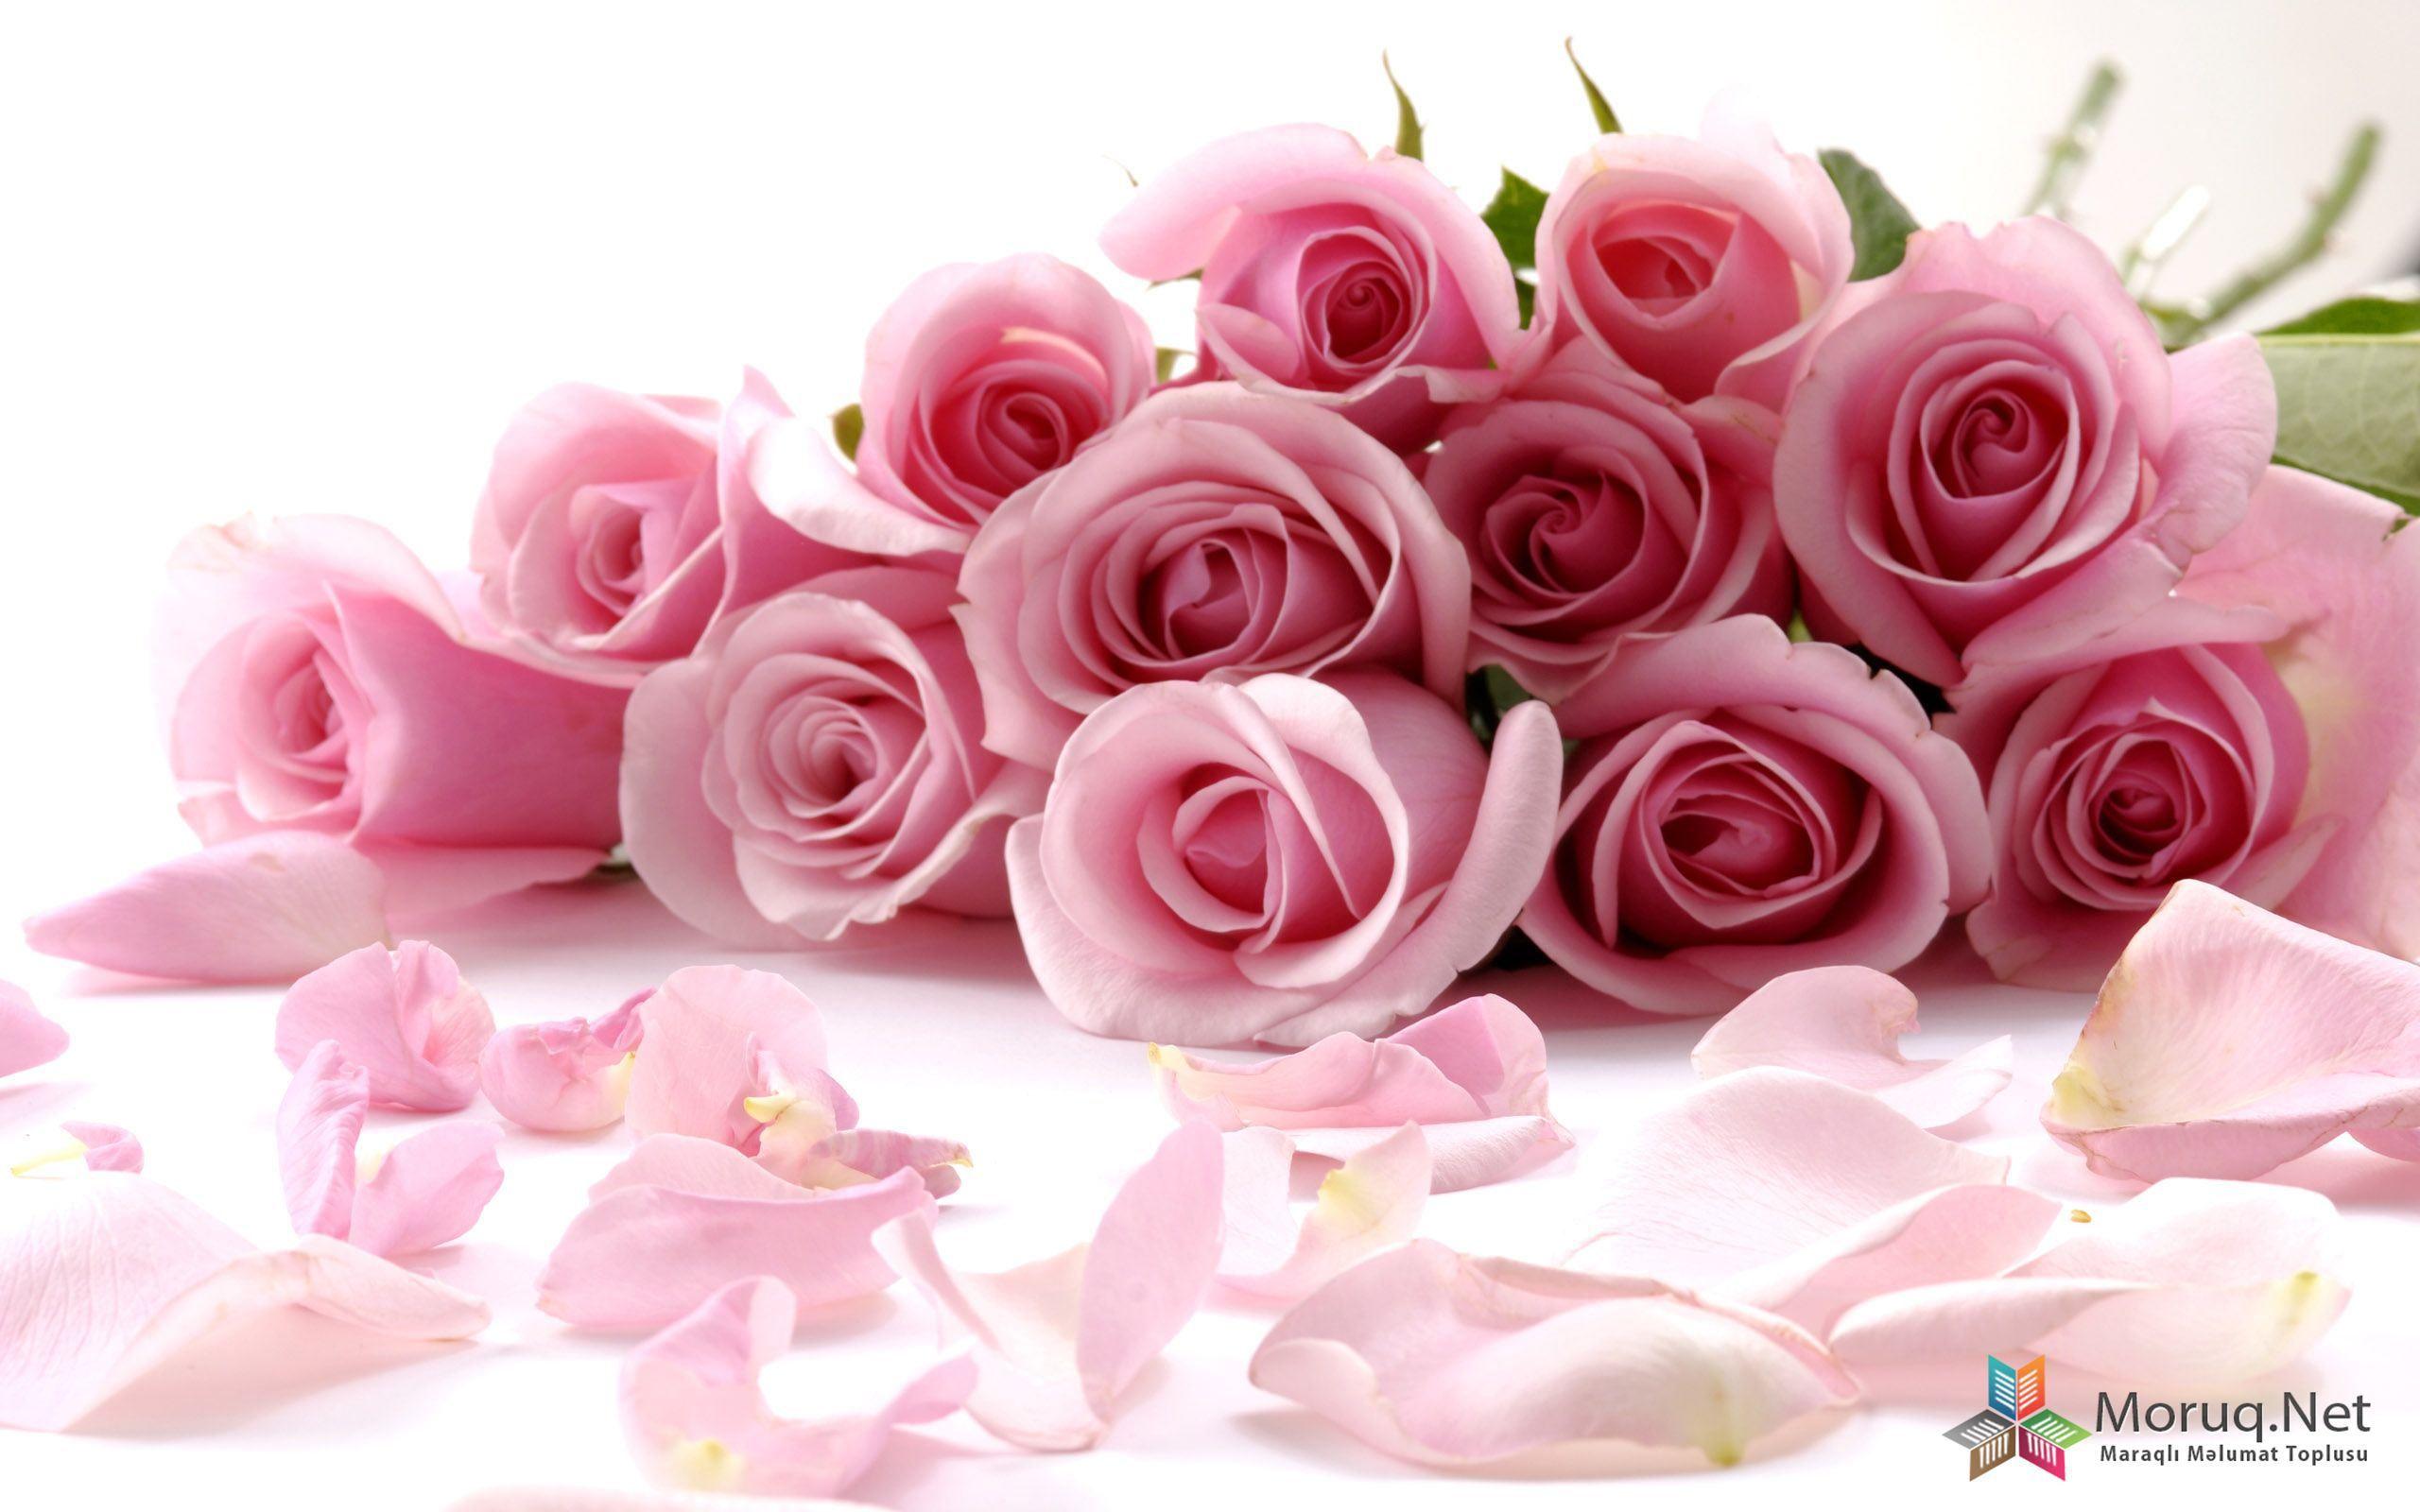 Qizilgul Sekilleri 19 Jpg 2560 1600 Birthday Flowers Beautiful Pink Roses Flower Wallpaper